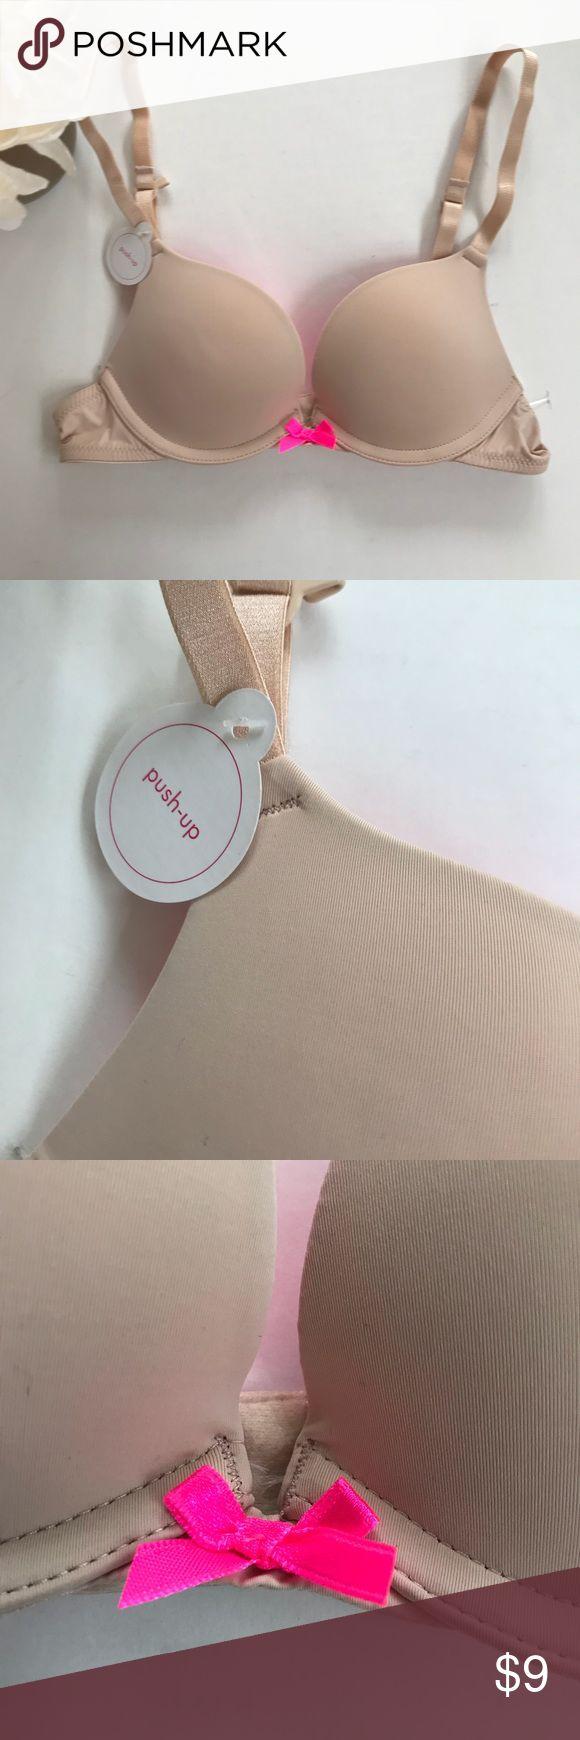 NWT-Xhilaration Nude Padded Wired Bra 32AA New with tags Xhilaration nude colored padded wired bra. Size 32AA. Perfect t-Shirt bra. Xhilaration Intimates & Sleepwear Bras